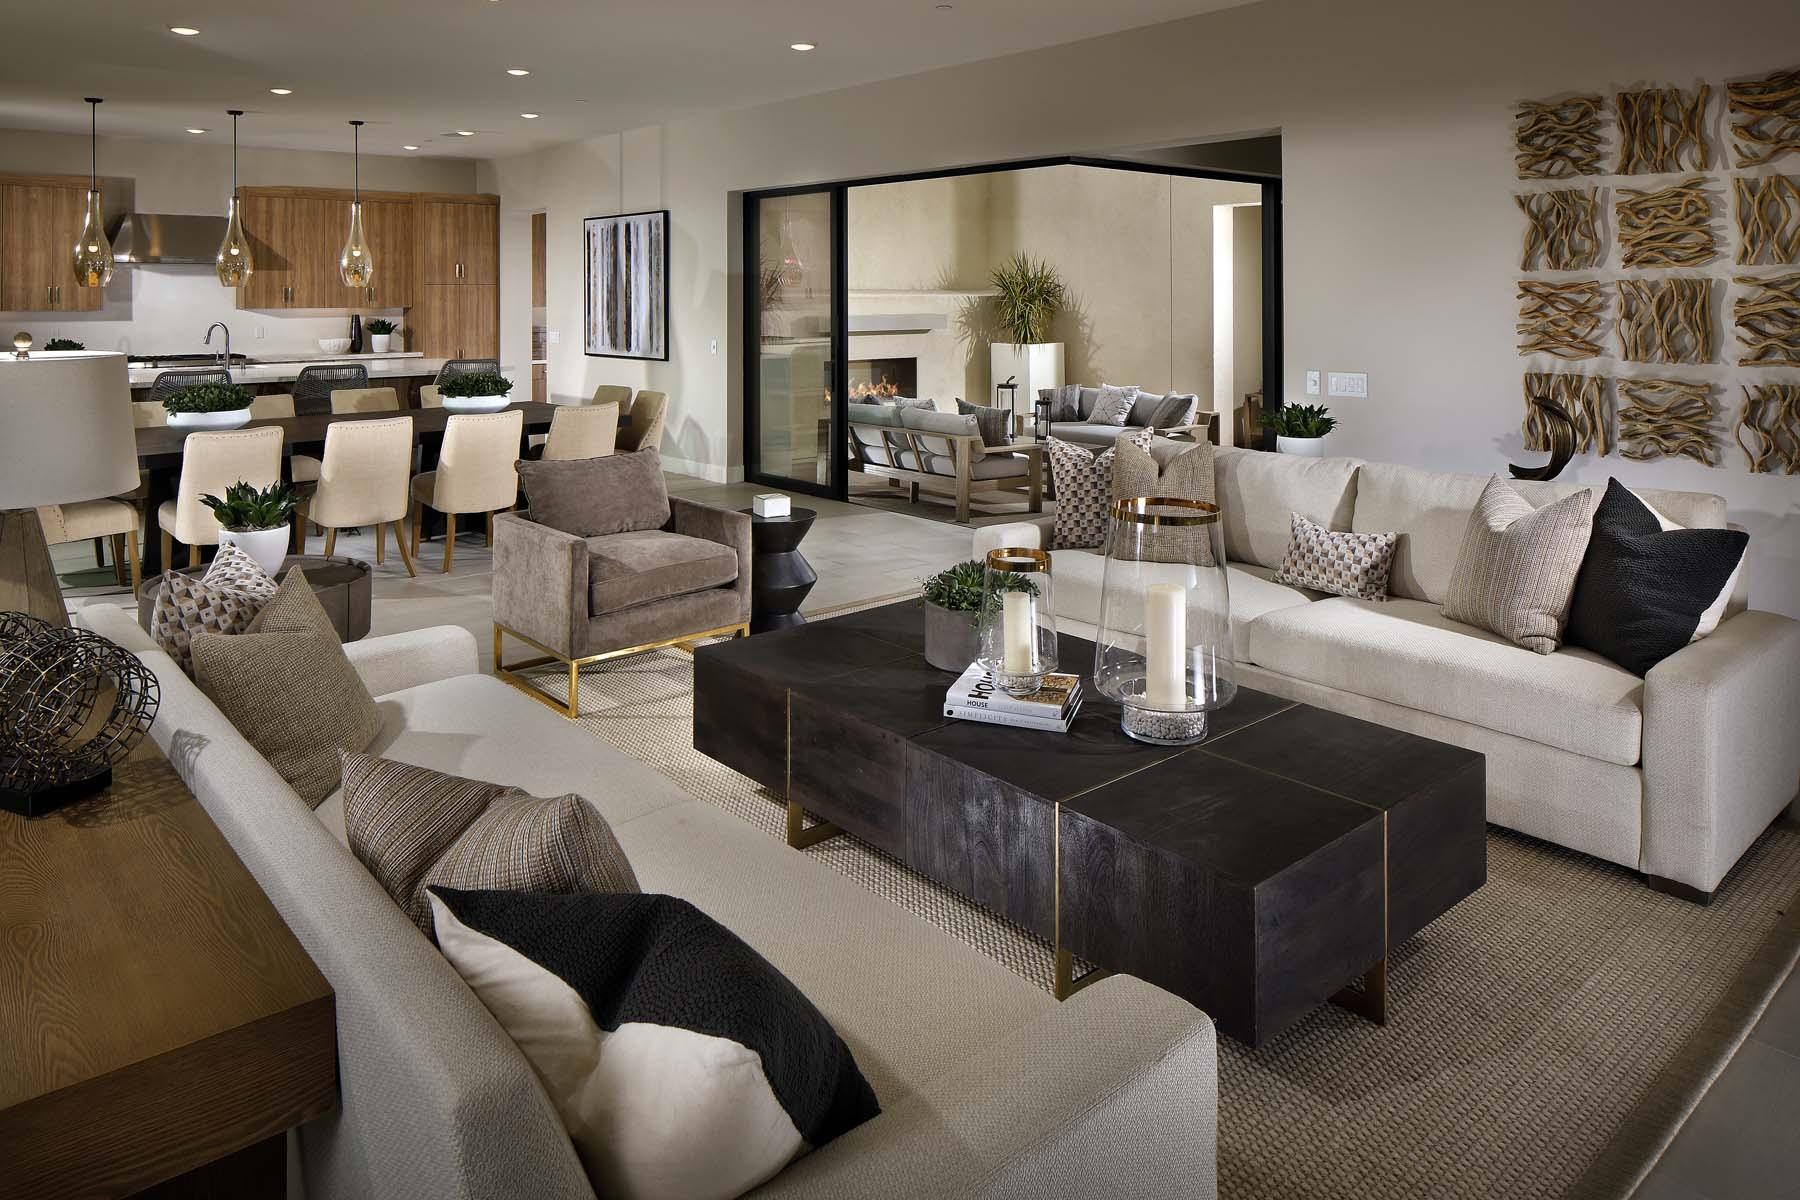 5300 Morning Sage Way Carmel Homesite 60, San Diego, CA 92130